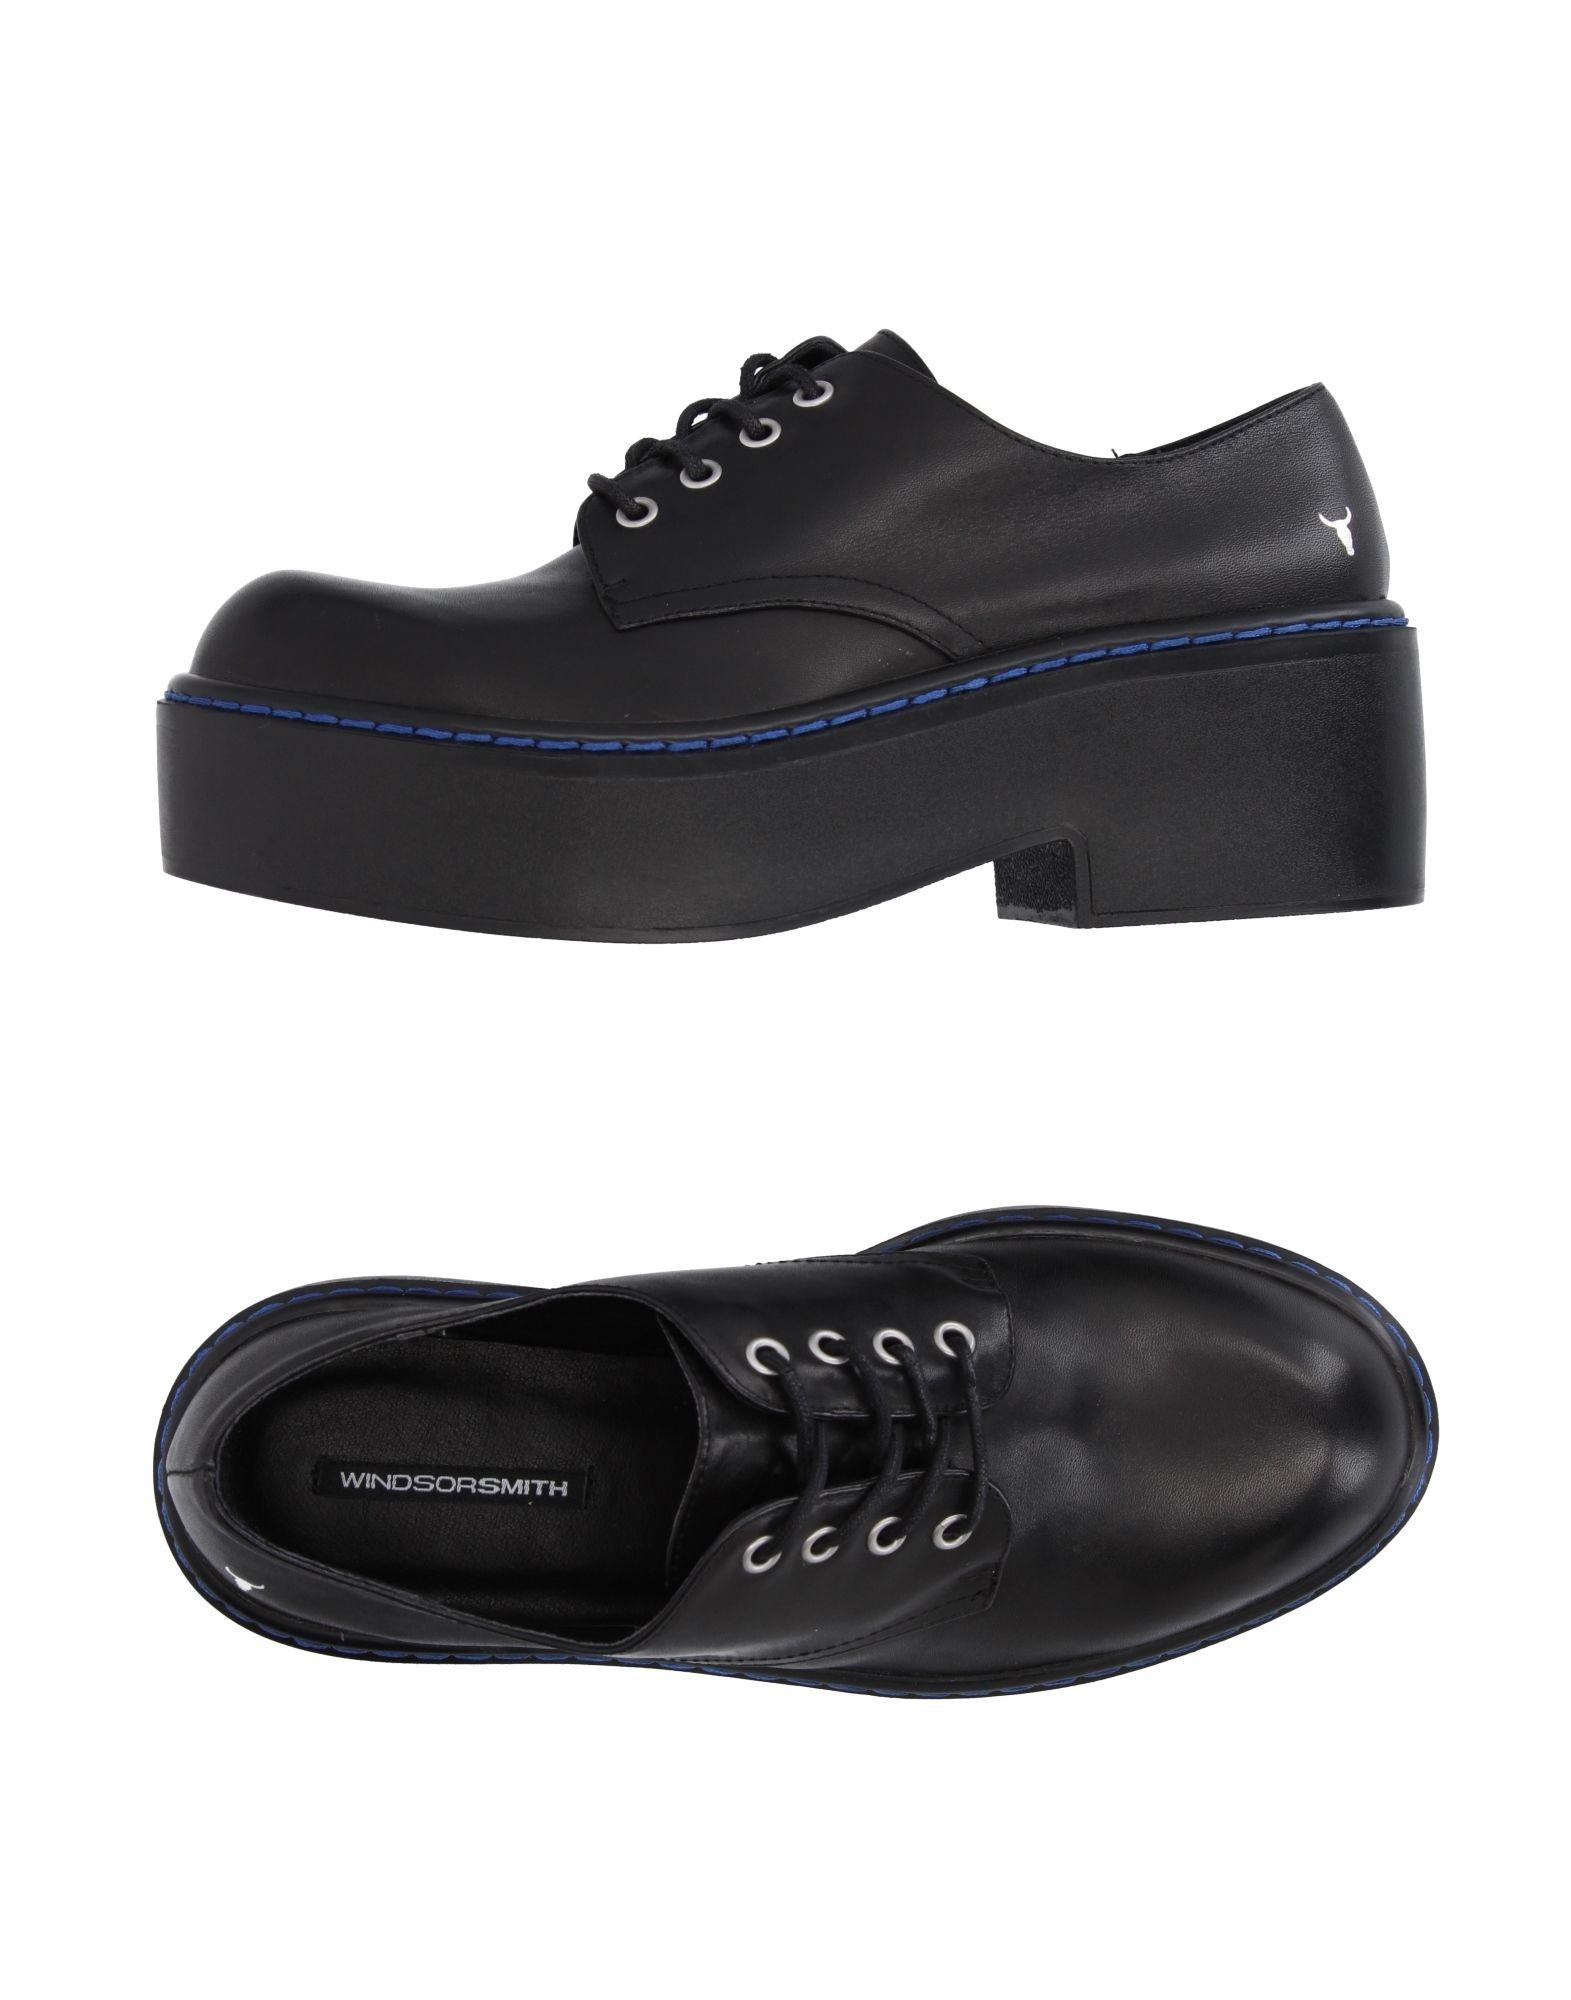 Фото - WINDSOR SMITH Обувь на шнурках alexander smith обувь на шнурках